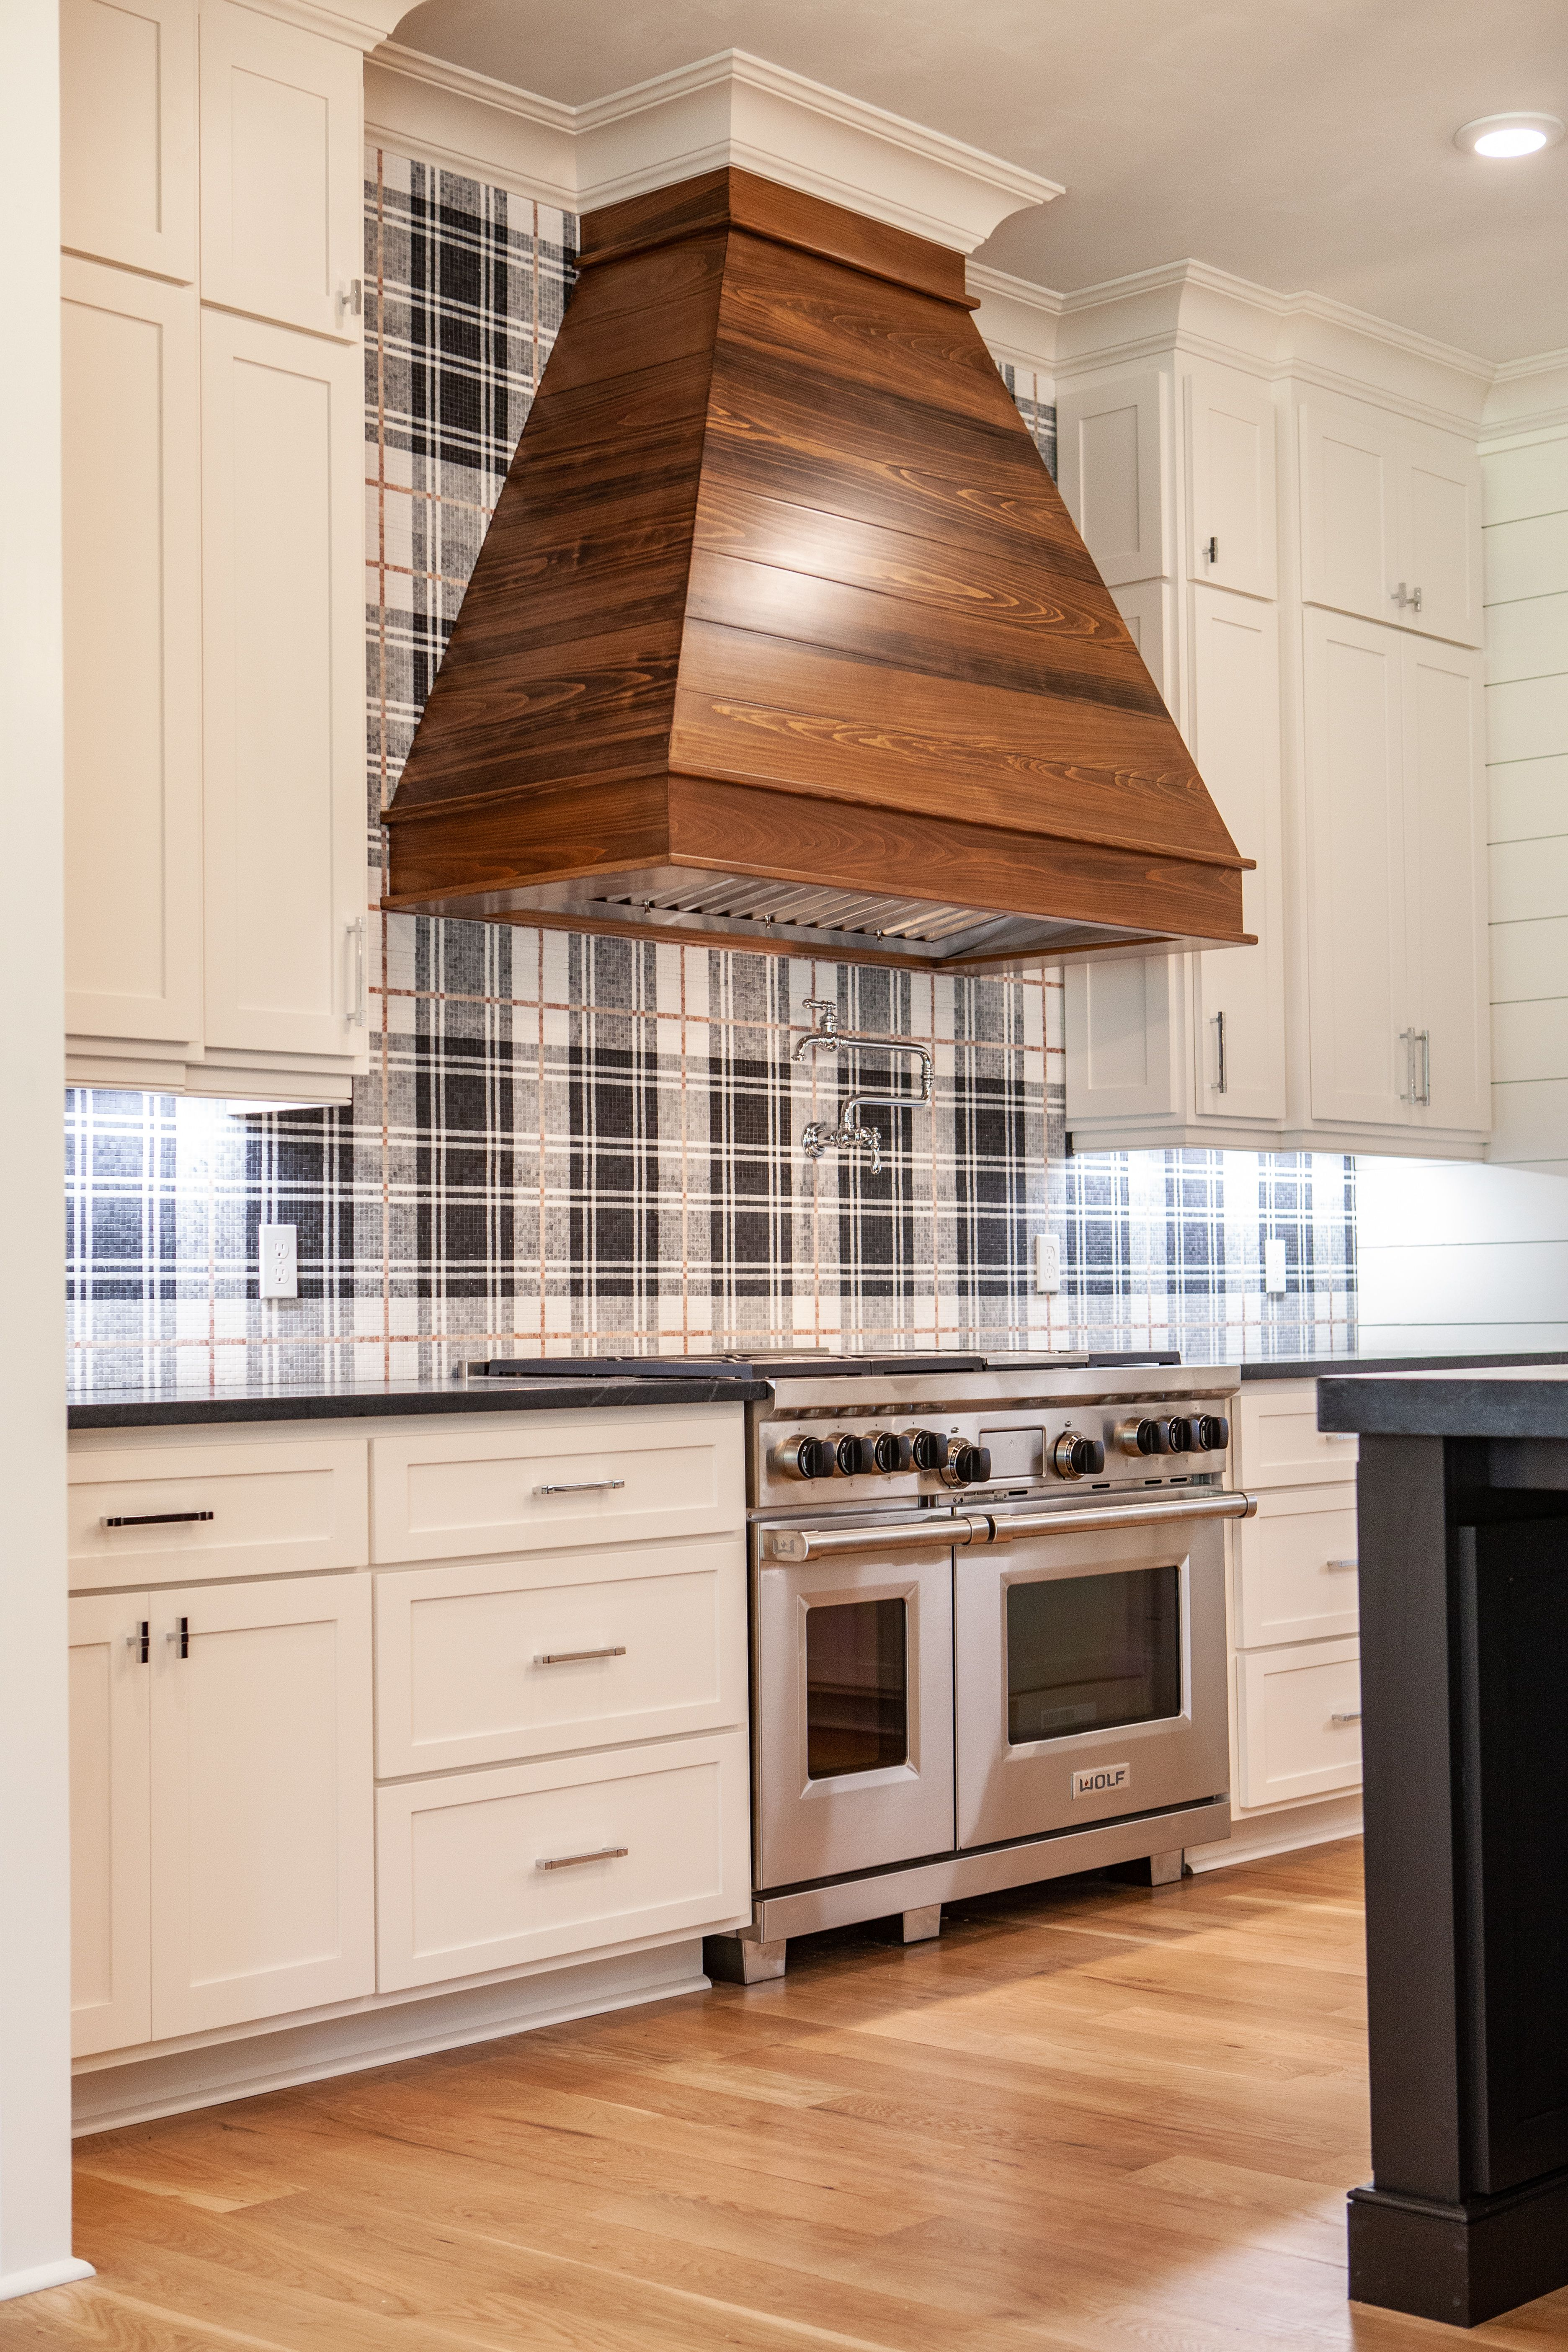 Custom cypress hood sub zerowolf appliances shiplap white oak